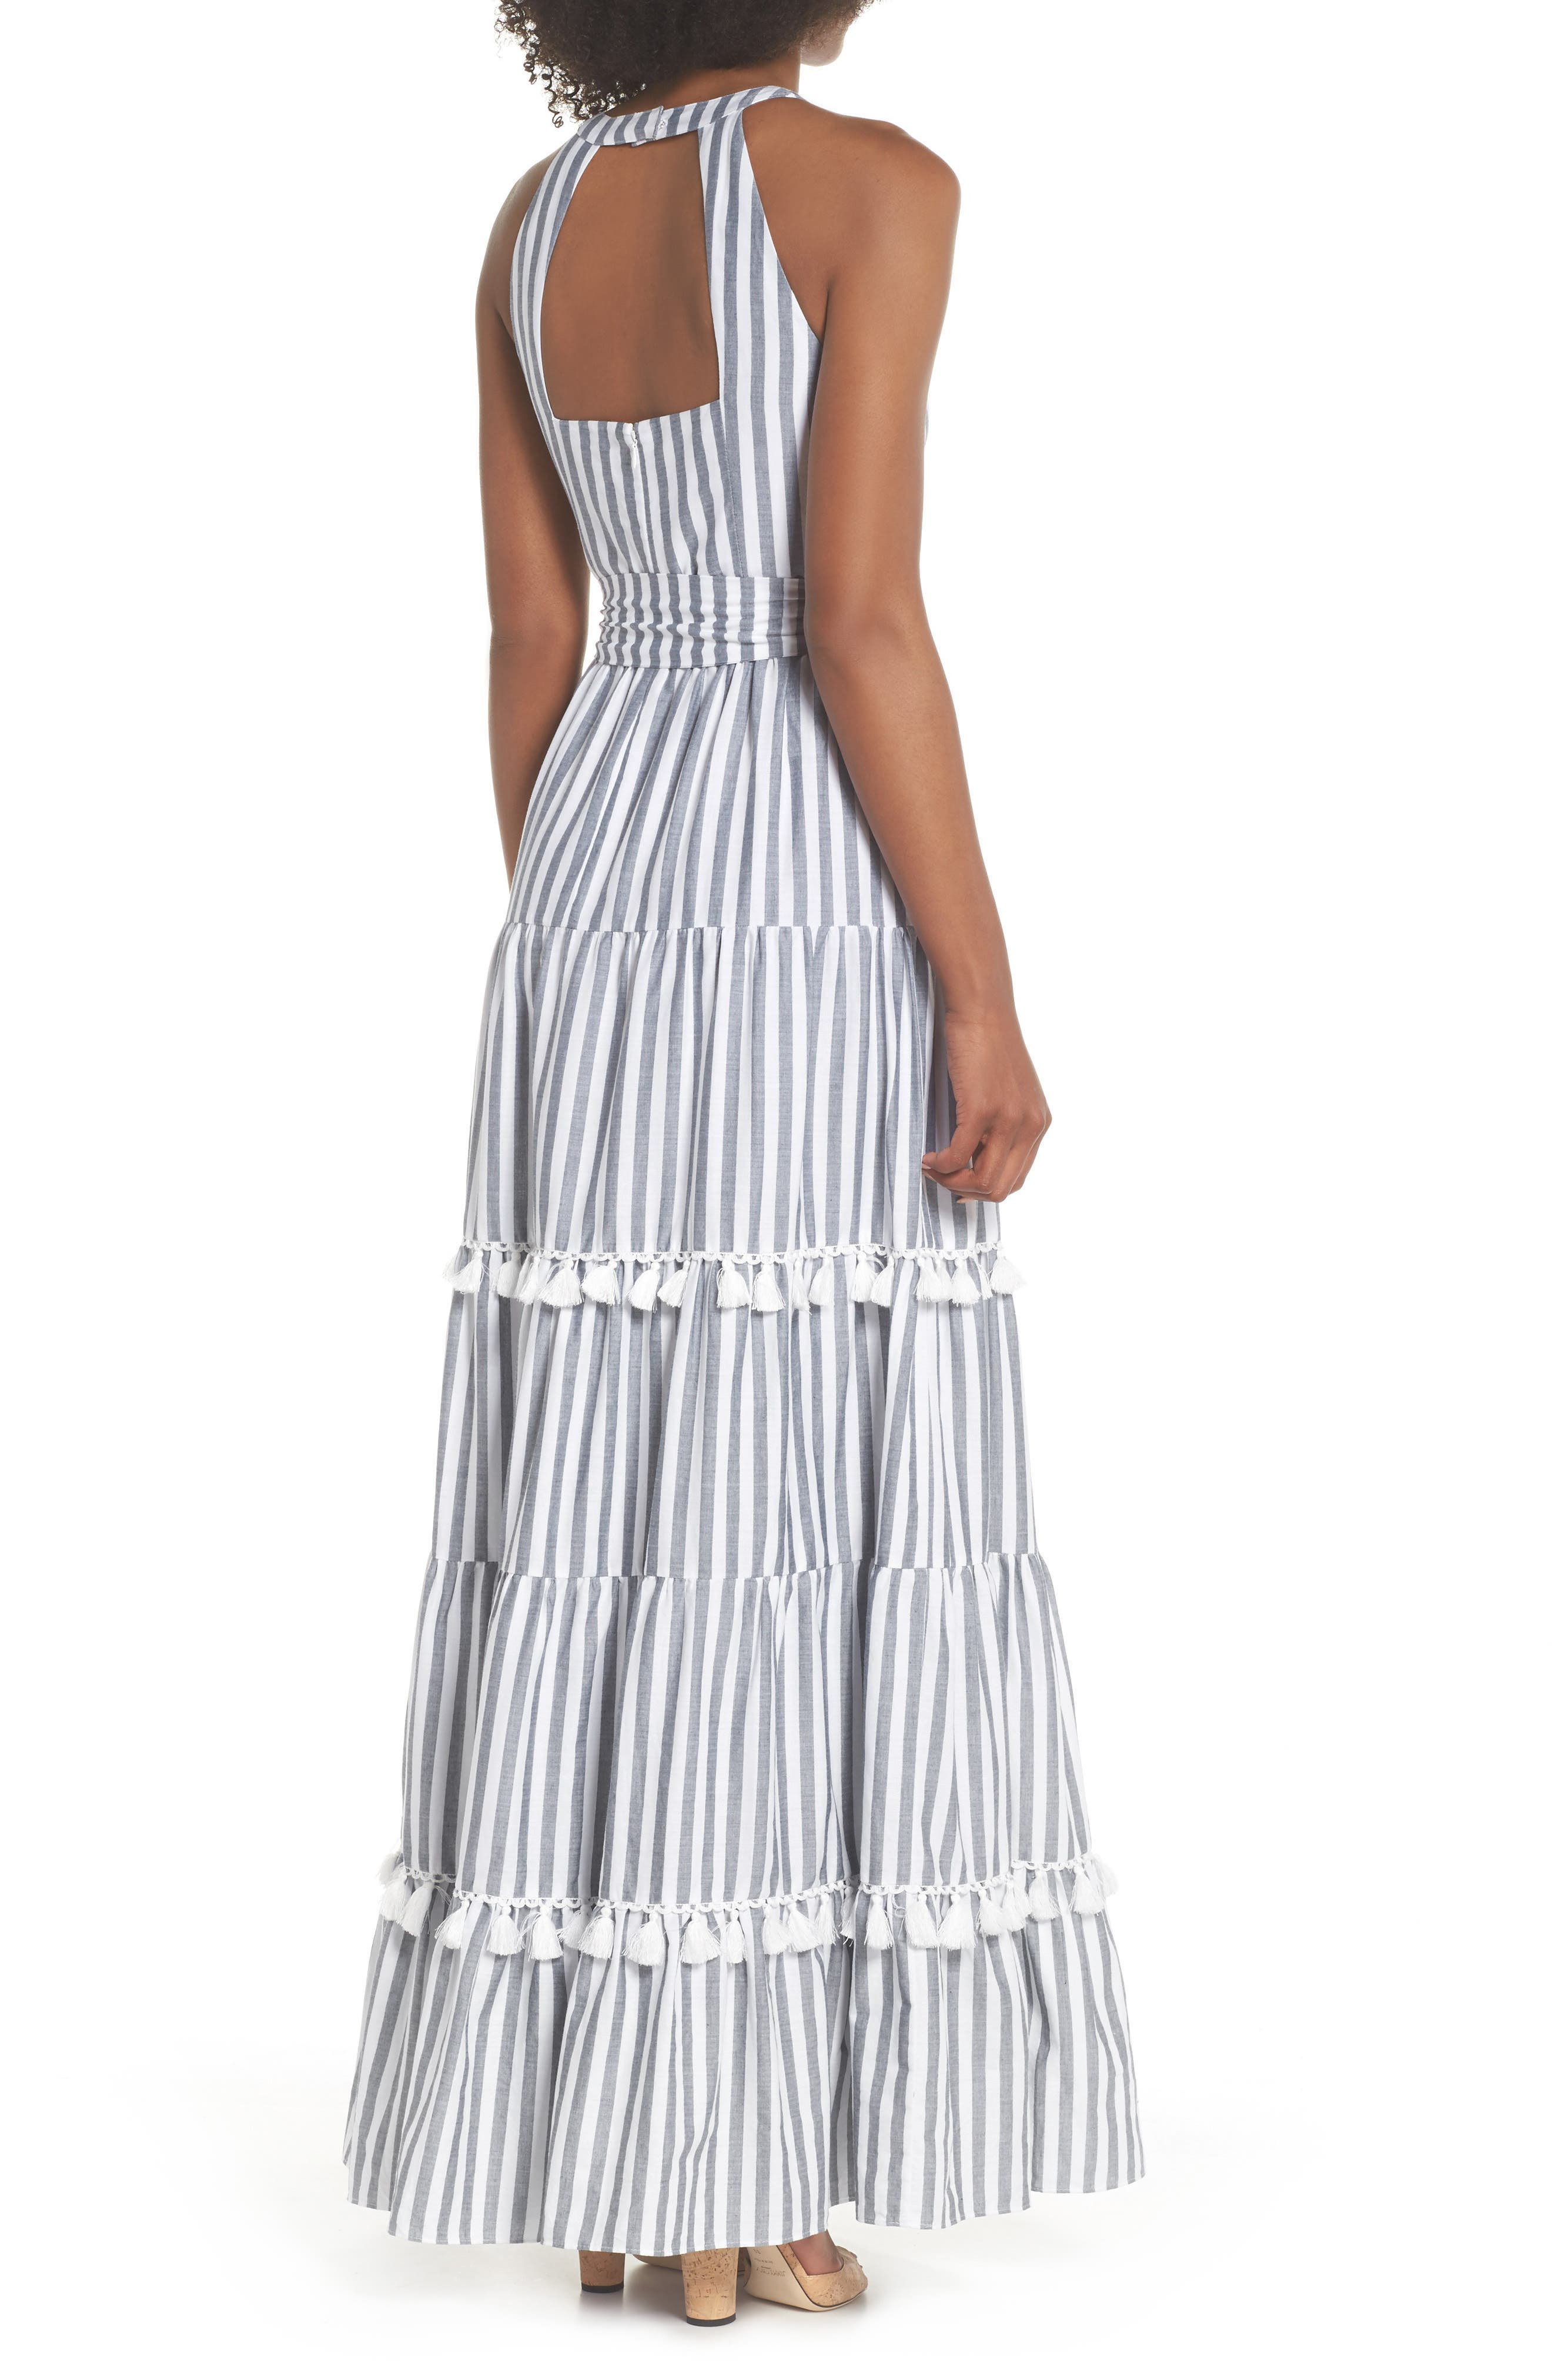 ELIZA J, Tiered Tassel Fringe Cotton Maxi Dress, Alternate thumbnail 2, color, IVORY/ GREY